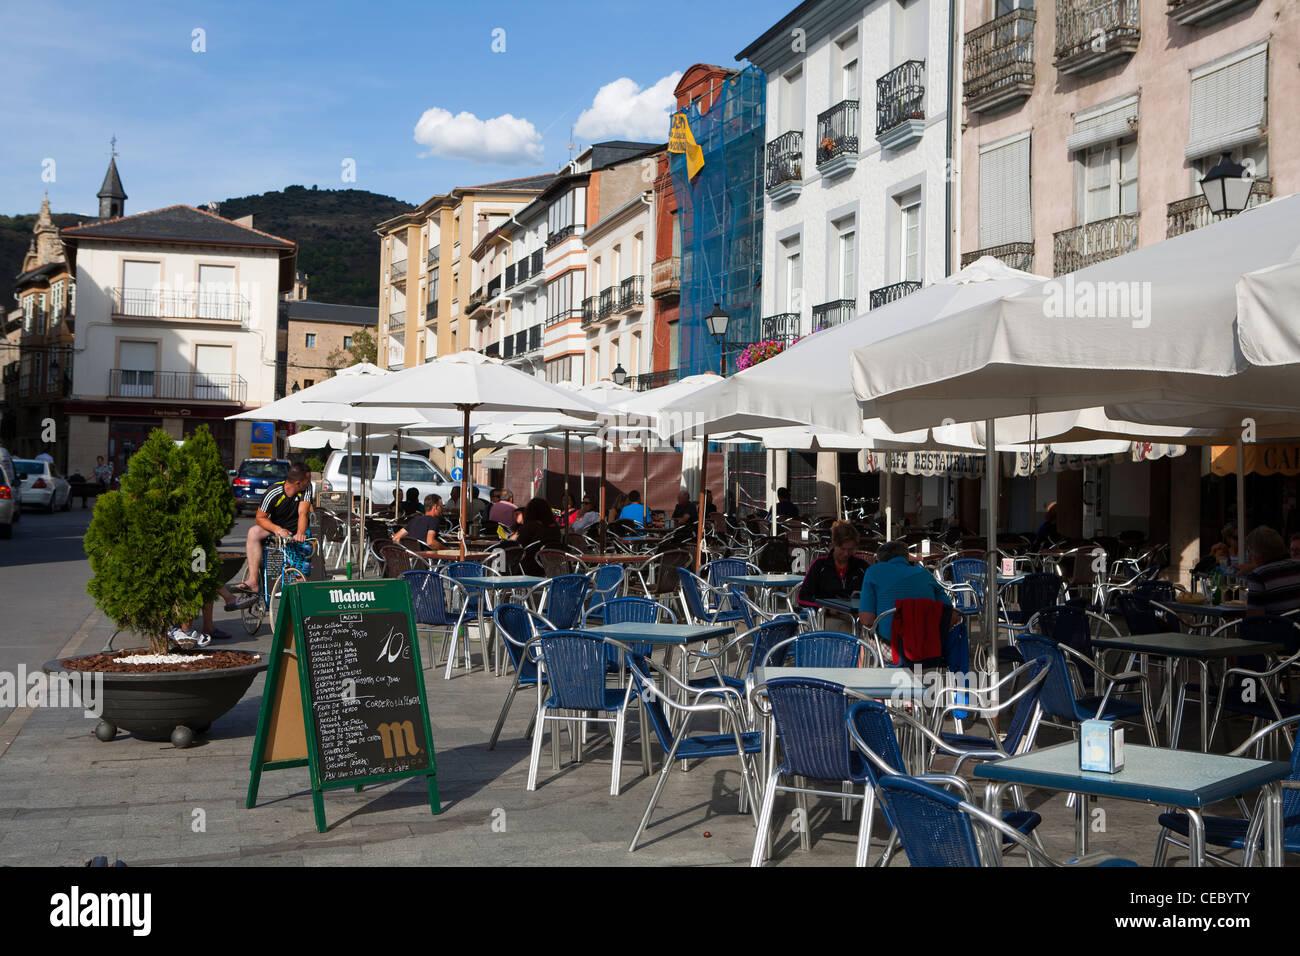 Cafes in the central square of Villafranca del Bierzo, a popular stop along the Camino de Santiago - Stock Image